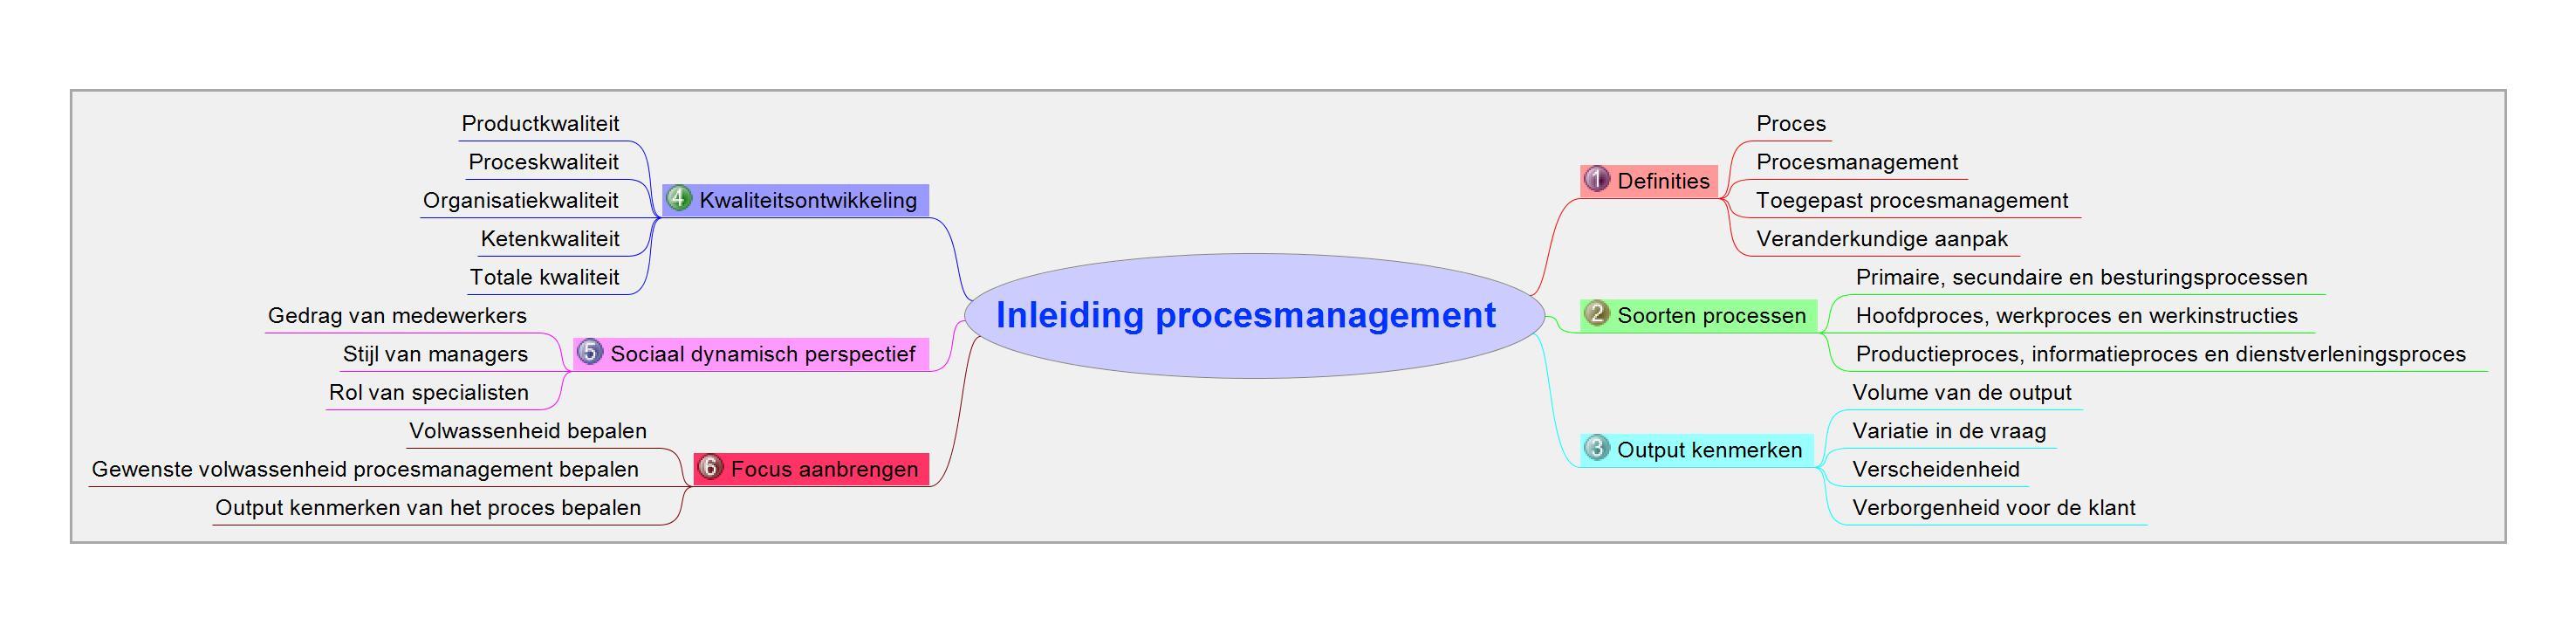 01 Inleiding procesmanagement